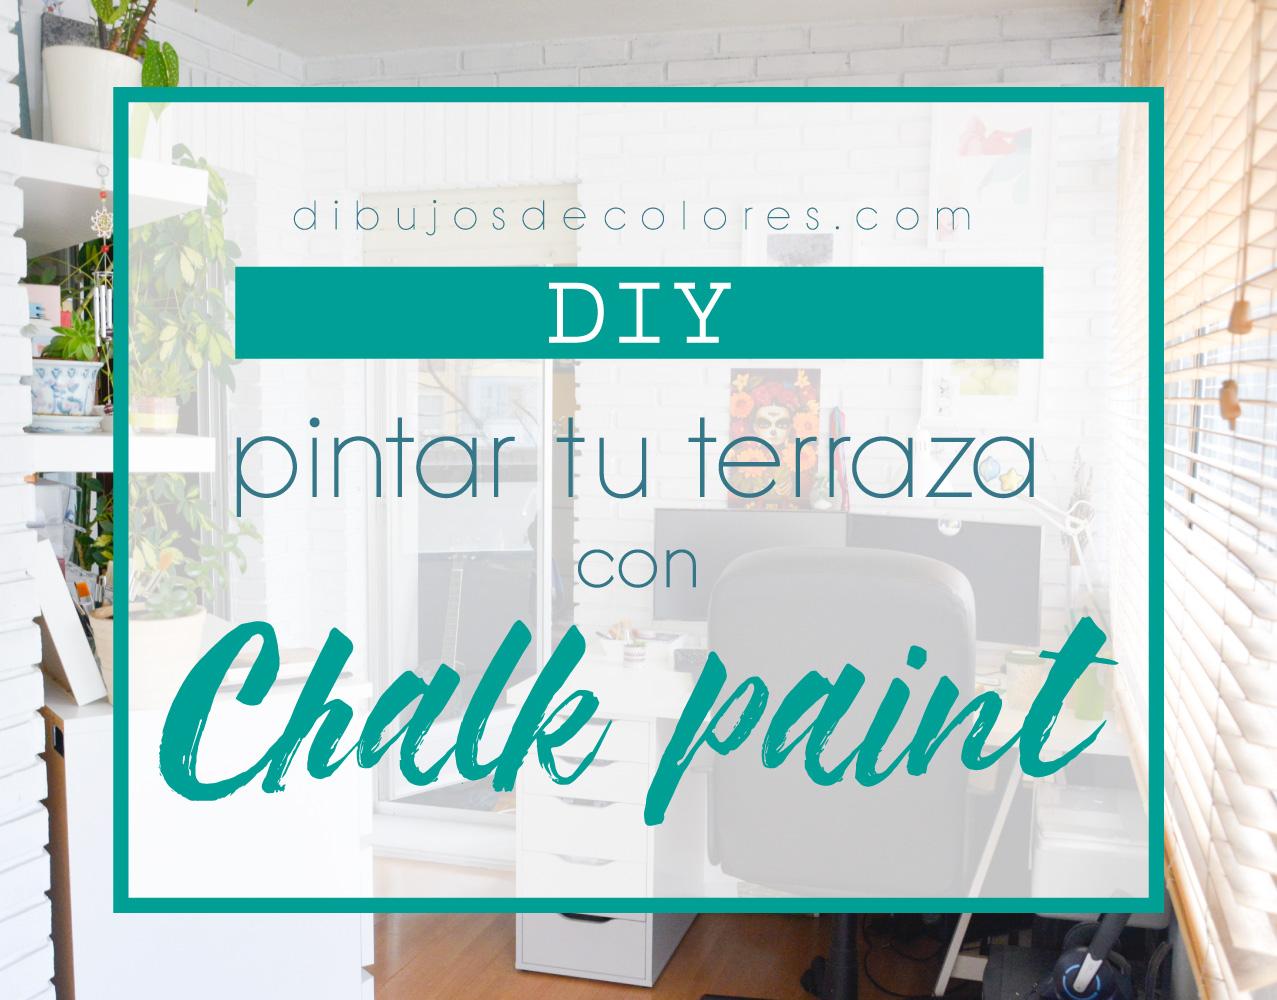 Diy pintar terraza con chalk paint